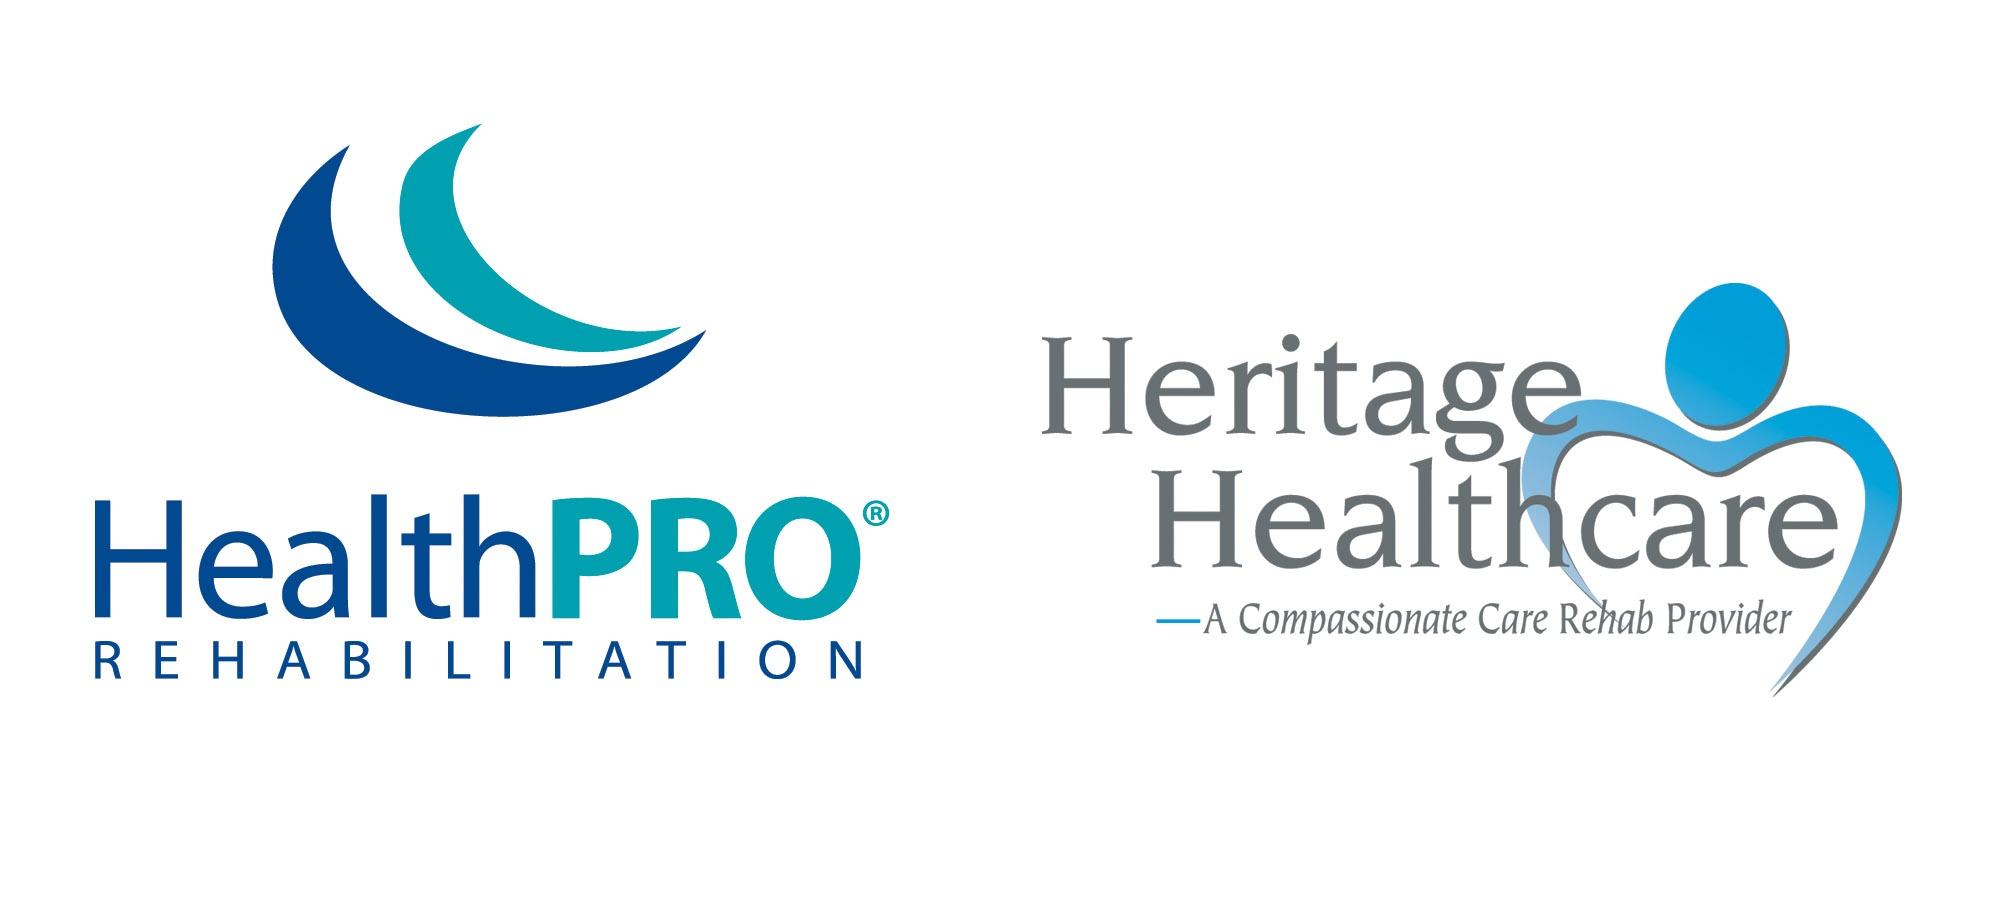 HP_HHI_Logos.jpg